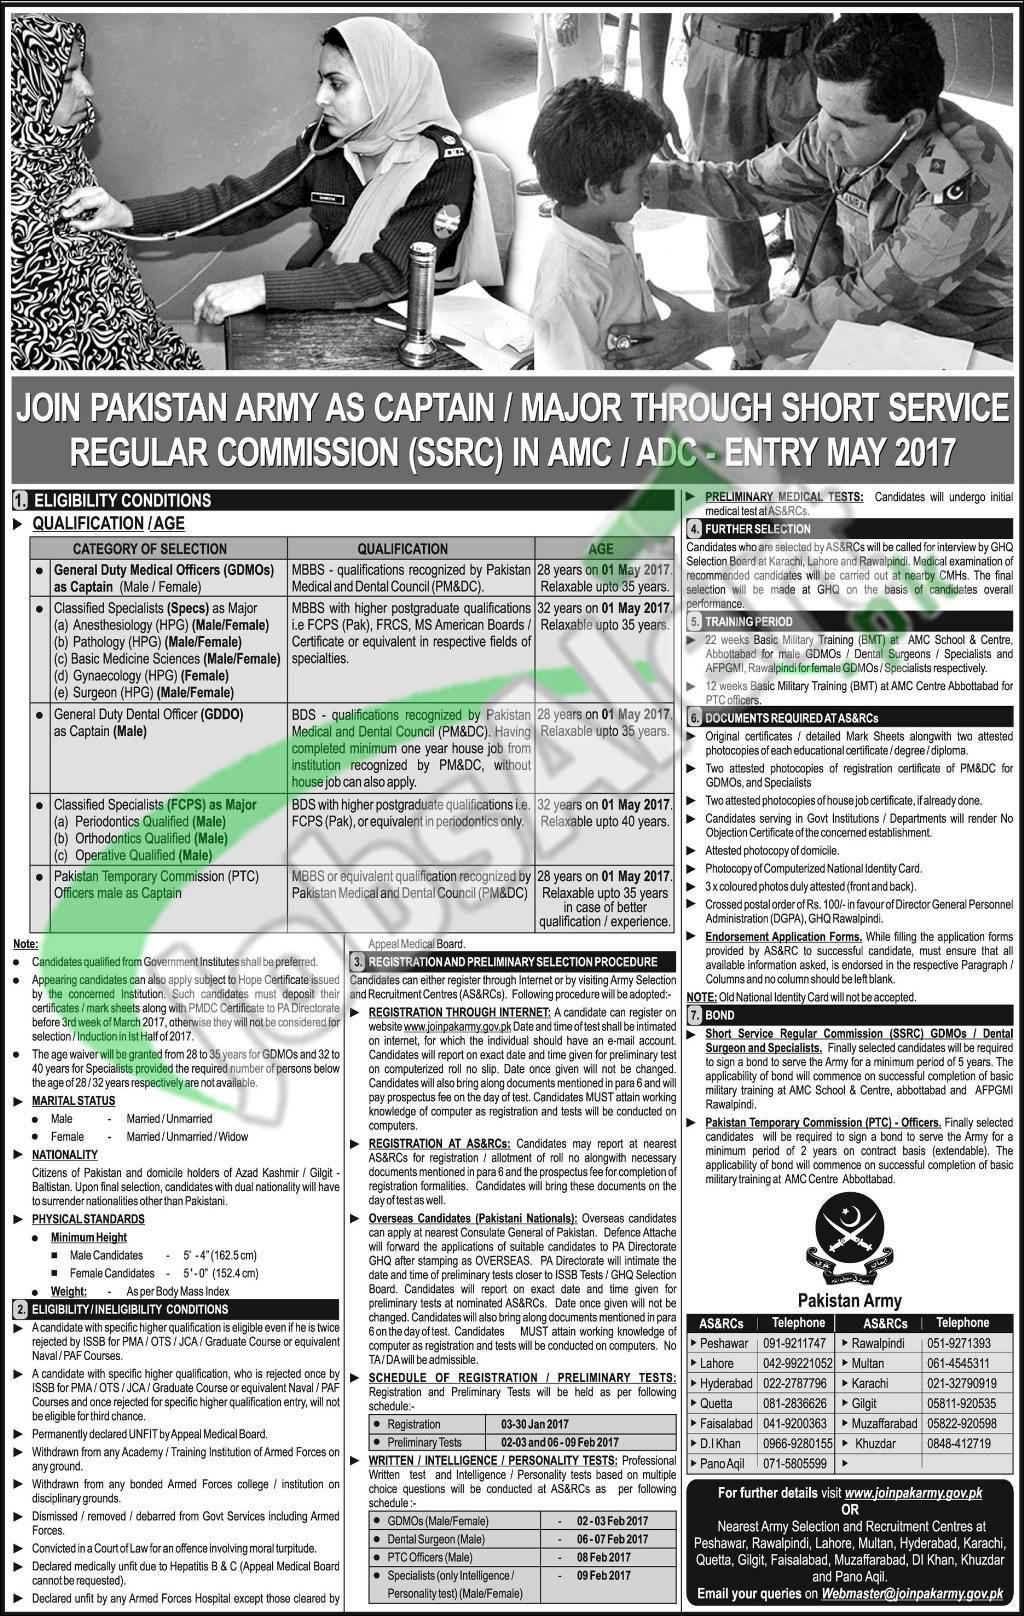 joinpakarmy gov pk as captain 2017 ssrc online